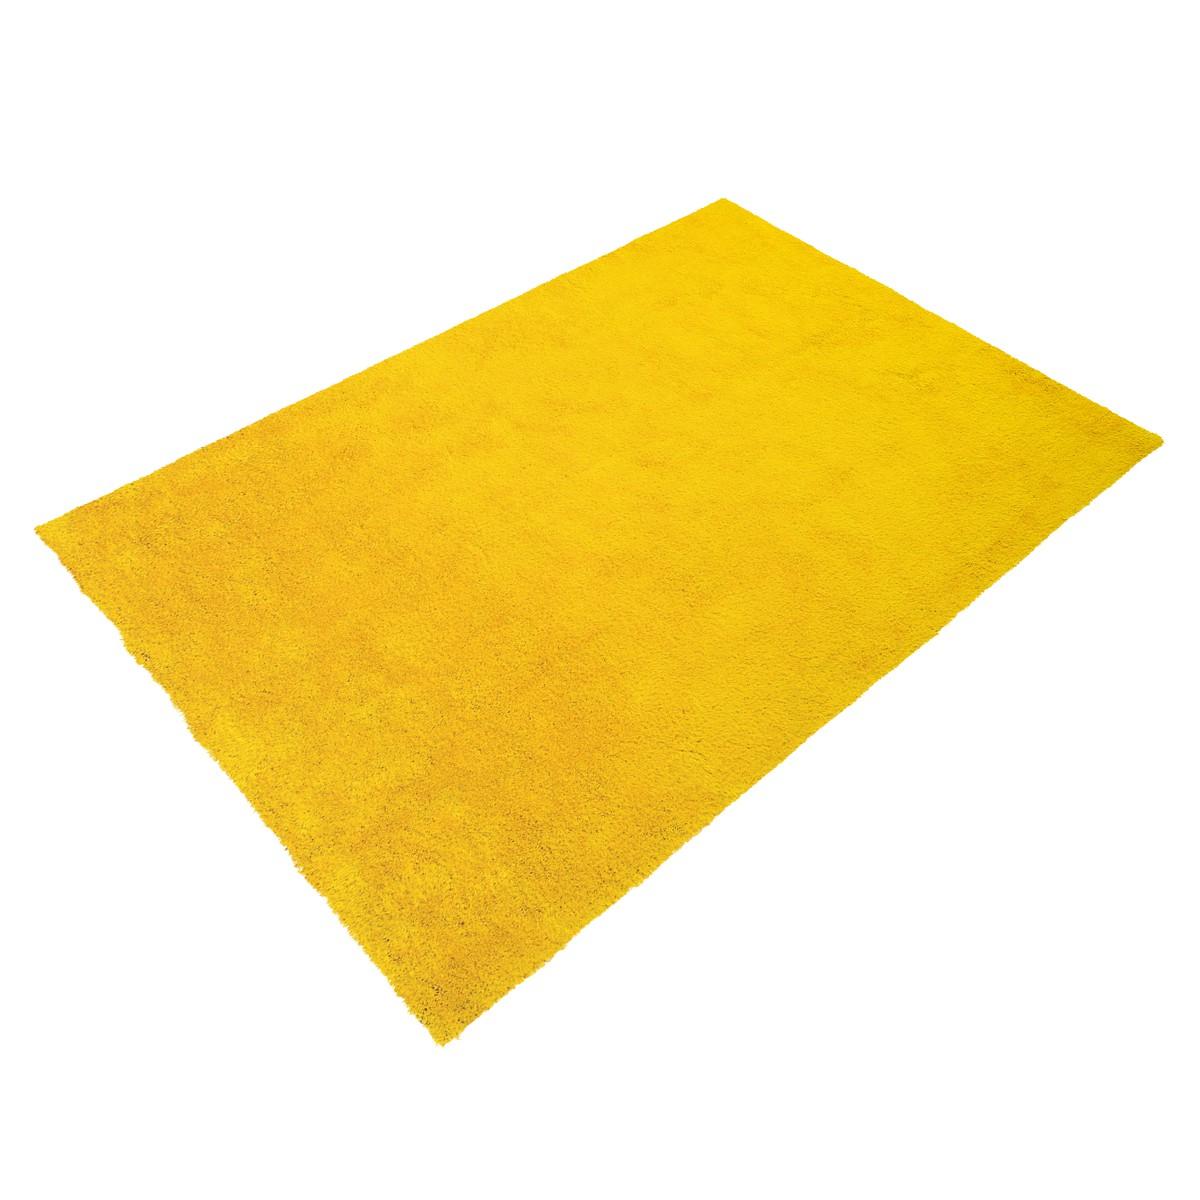 lars contzen teppich colourcourage design teppich shaggy hochflor curry gelb ebay. Black Bedroom Furniture Sets. Home Design Ideas